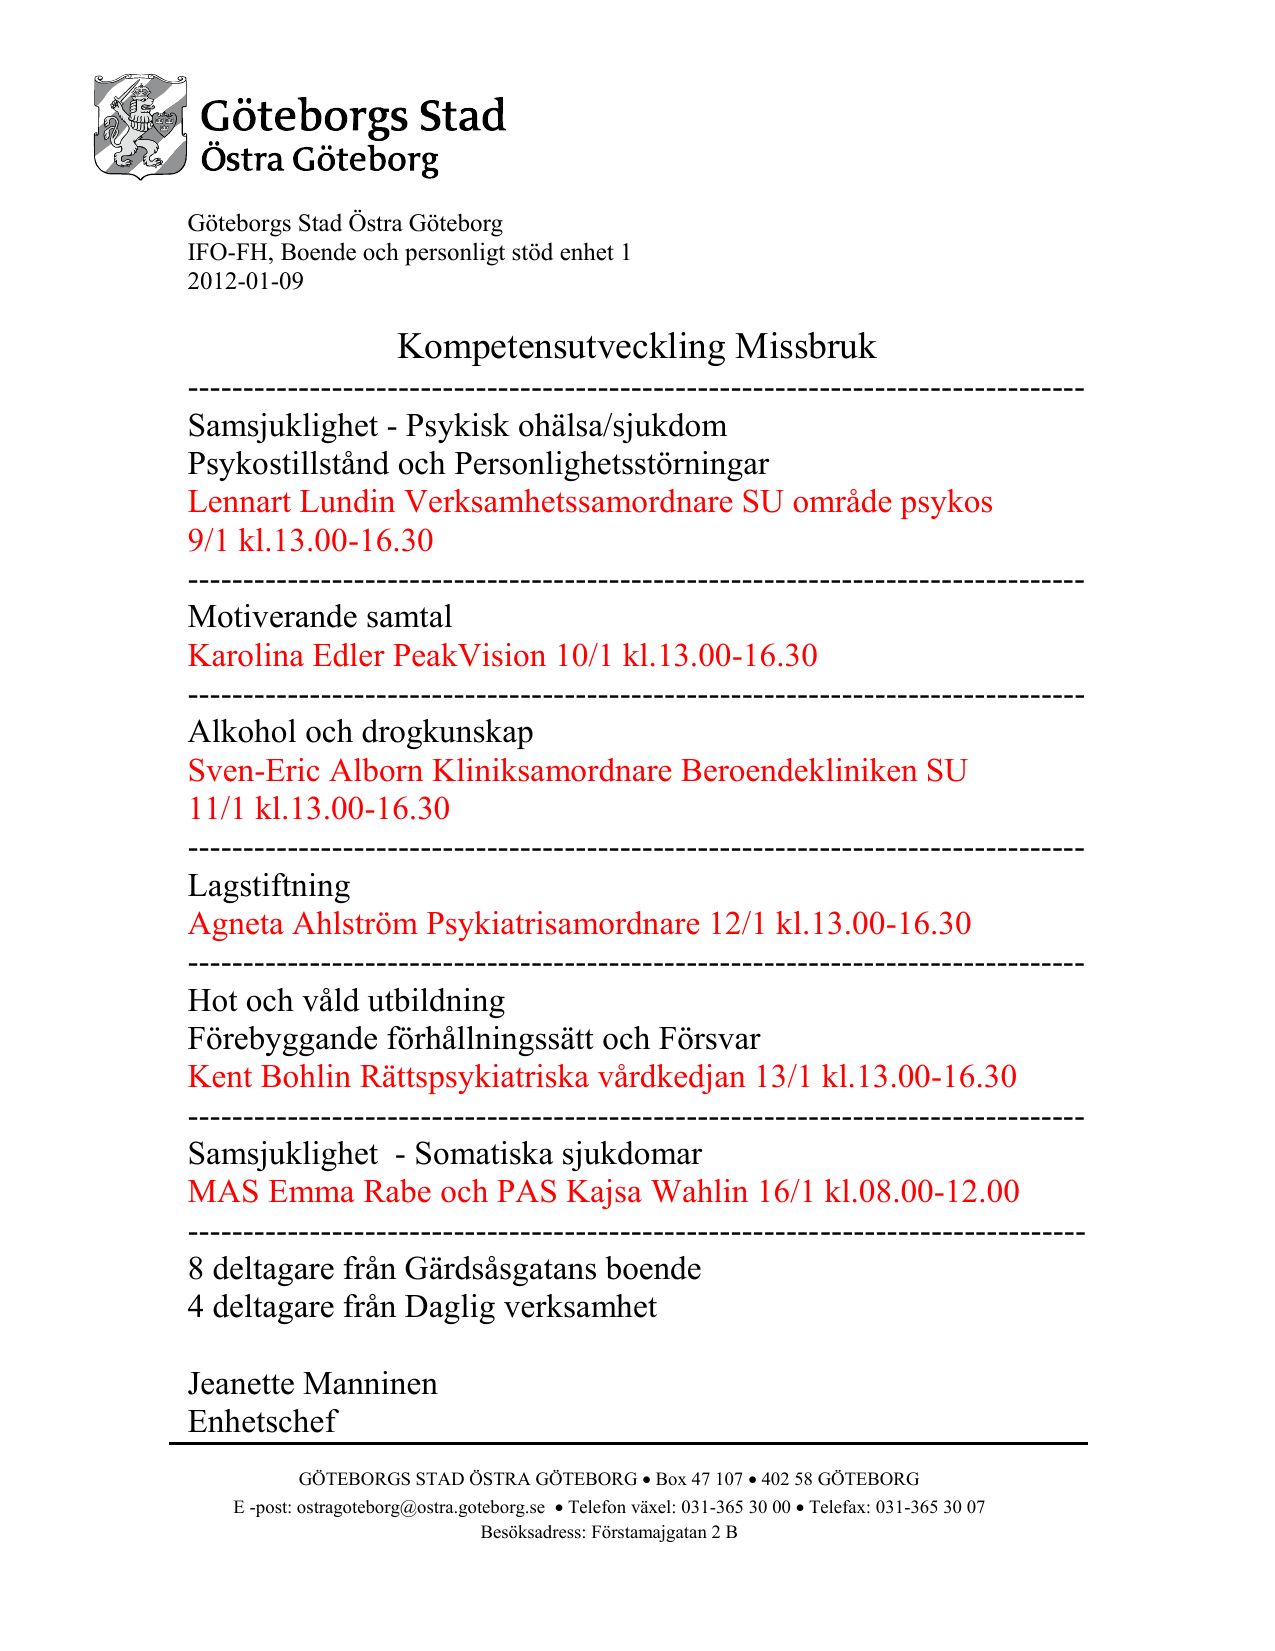 epost göteborgs stad